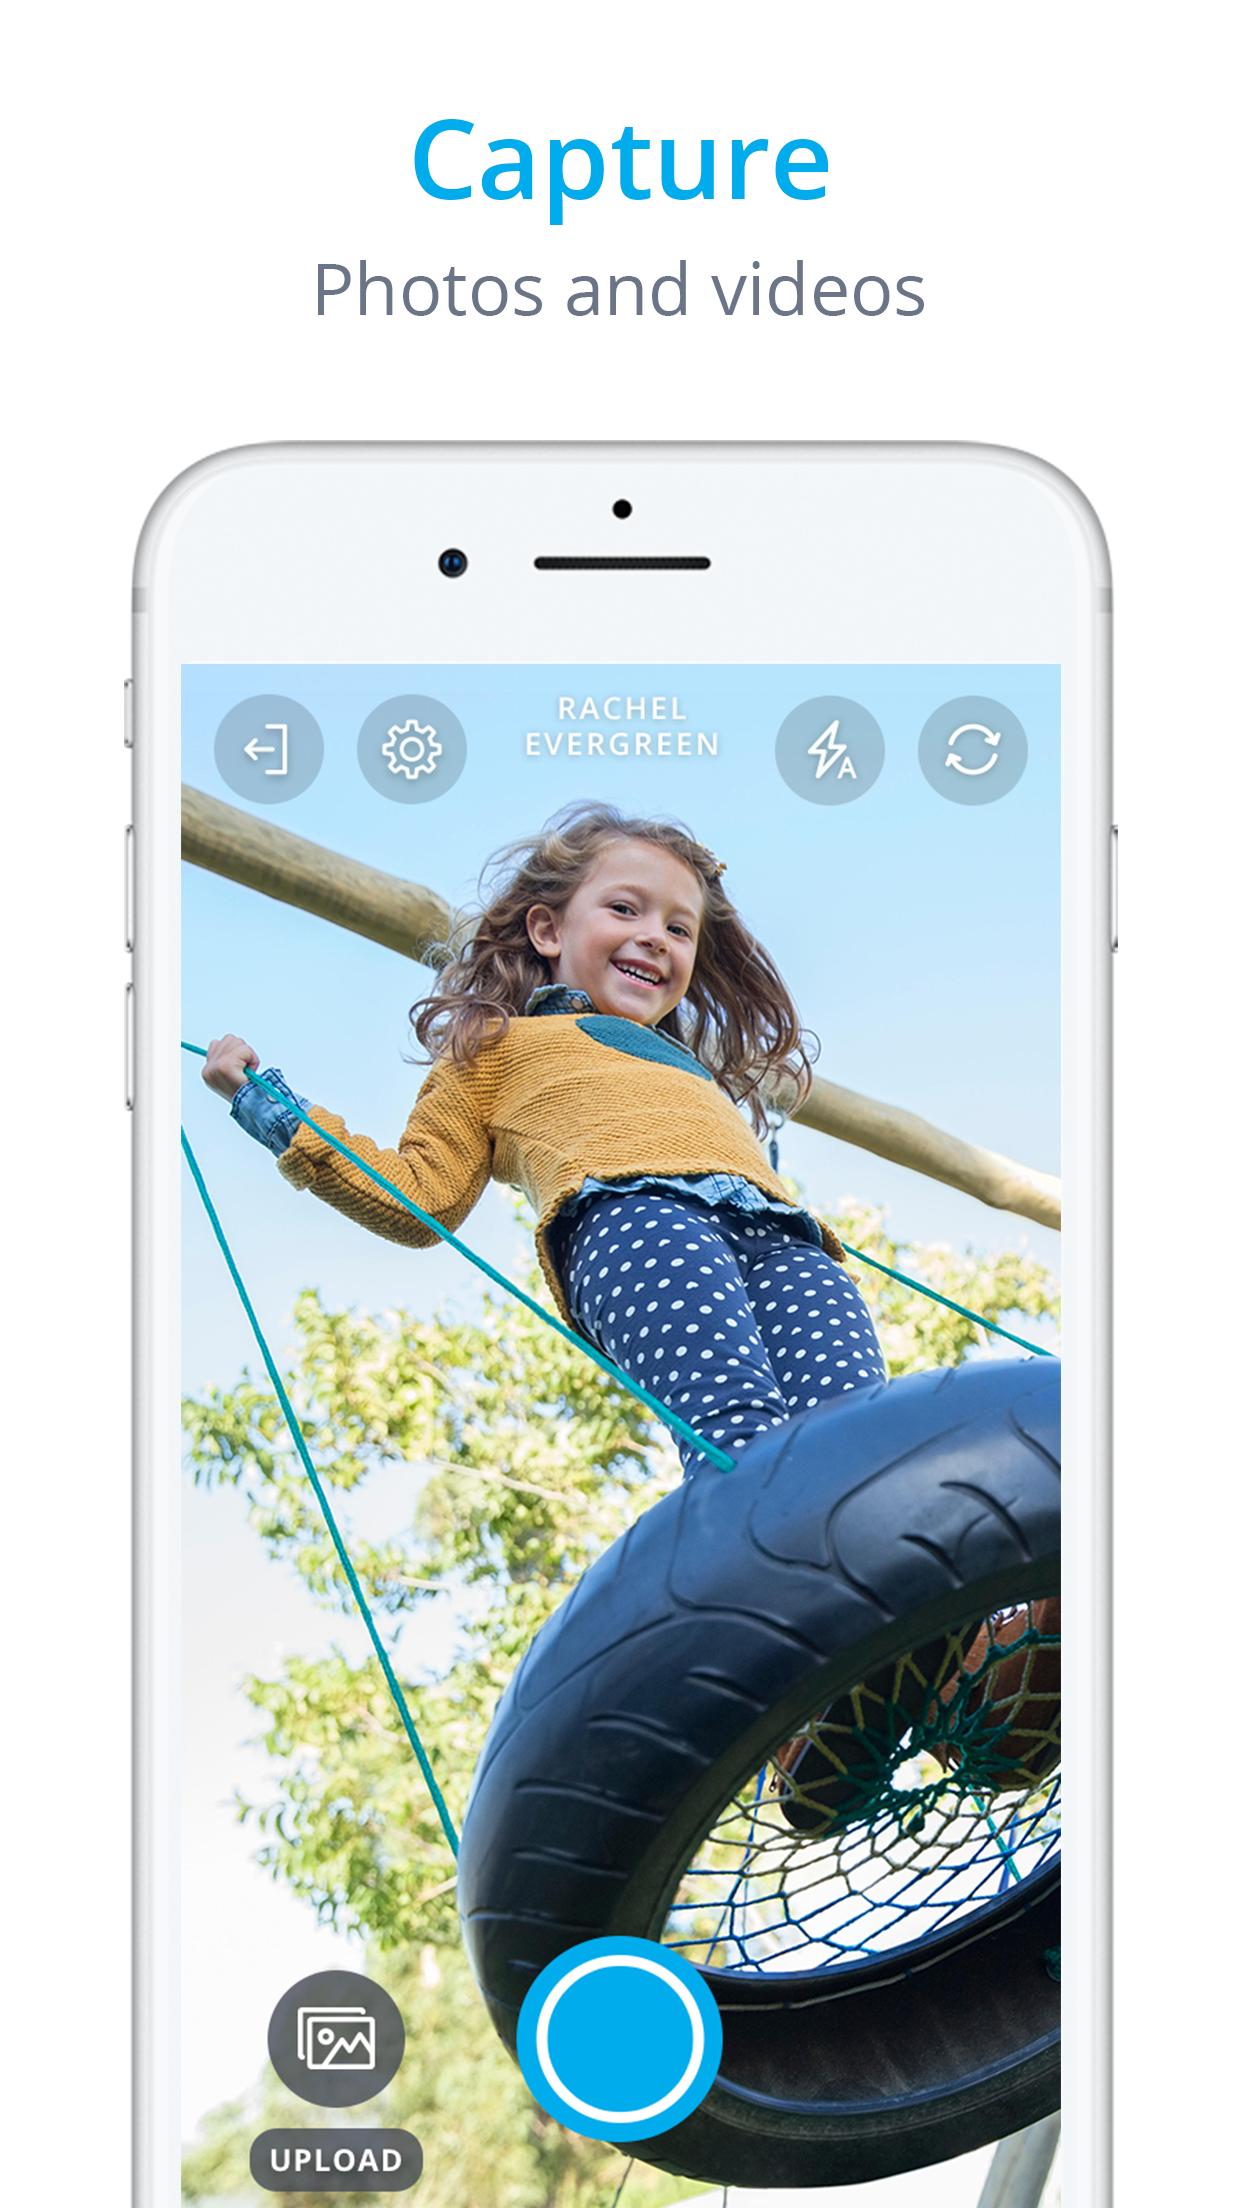 InfoMentor Media App - iPhone Screenshot 1.png